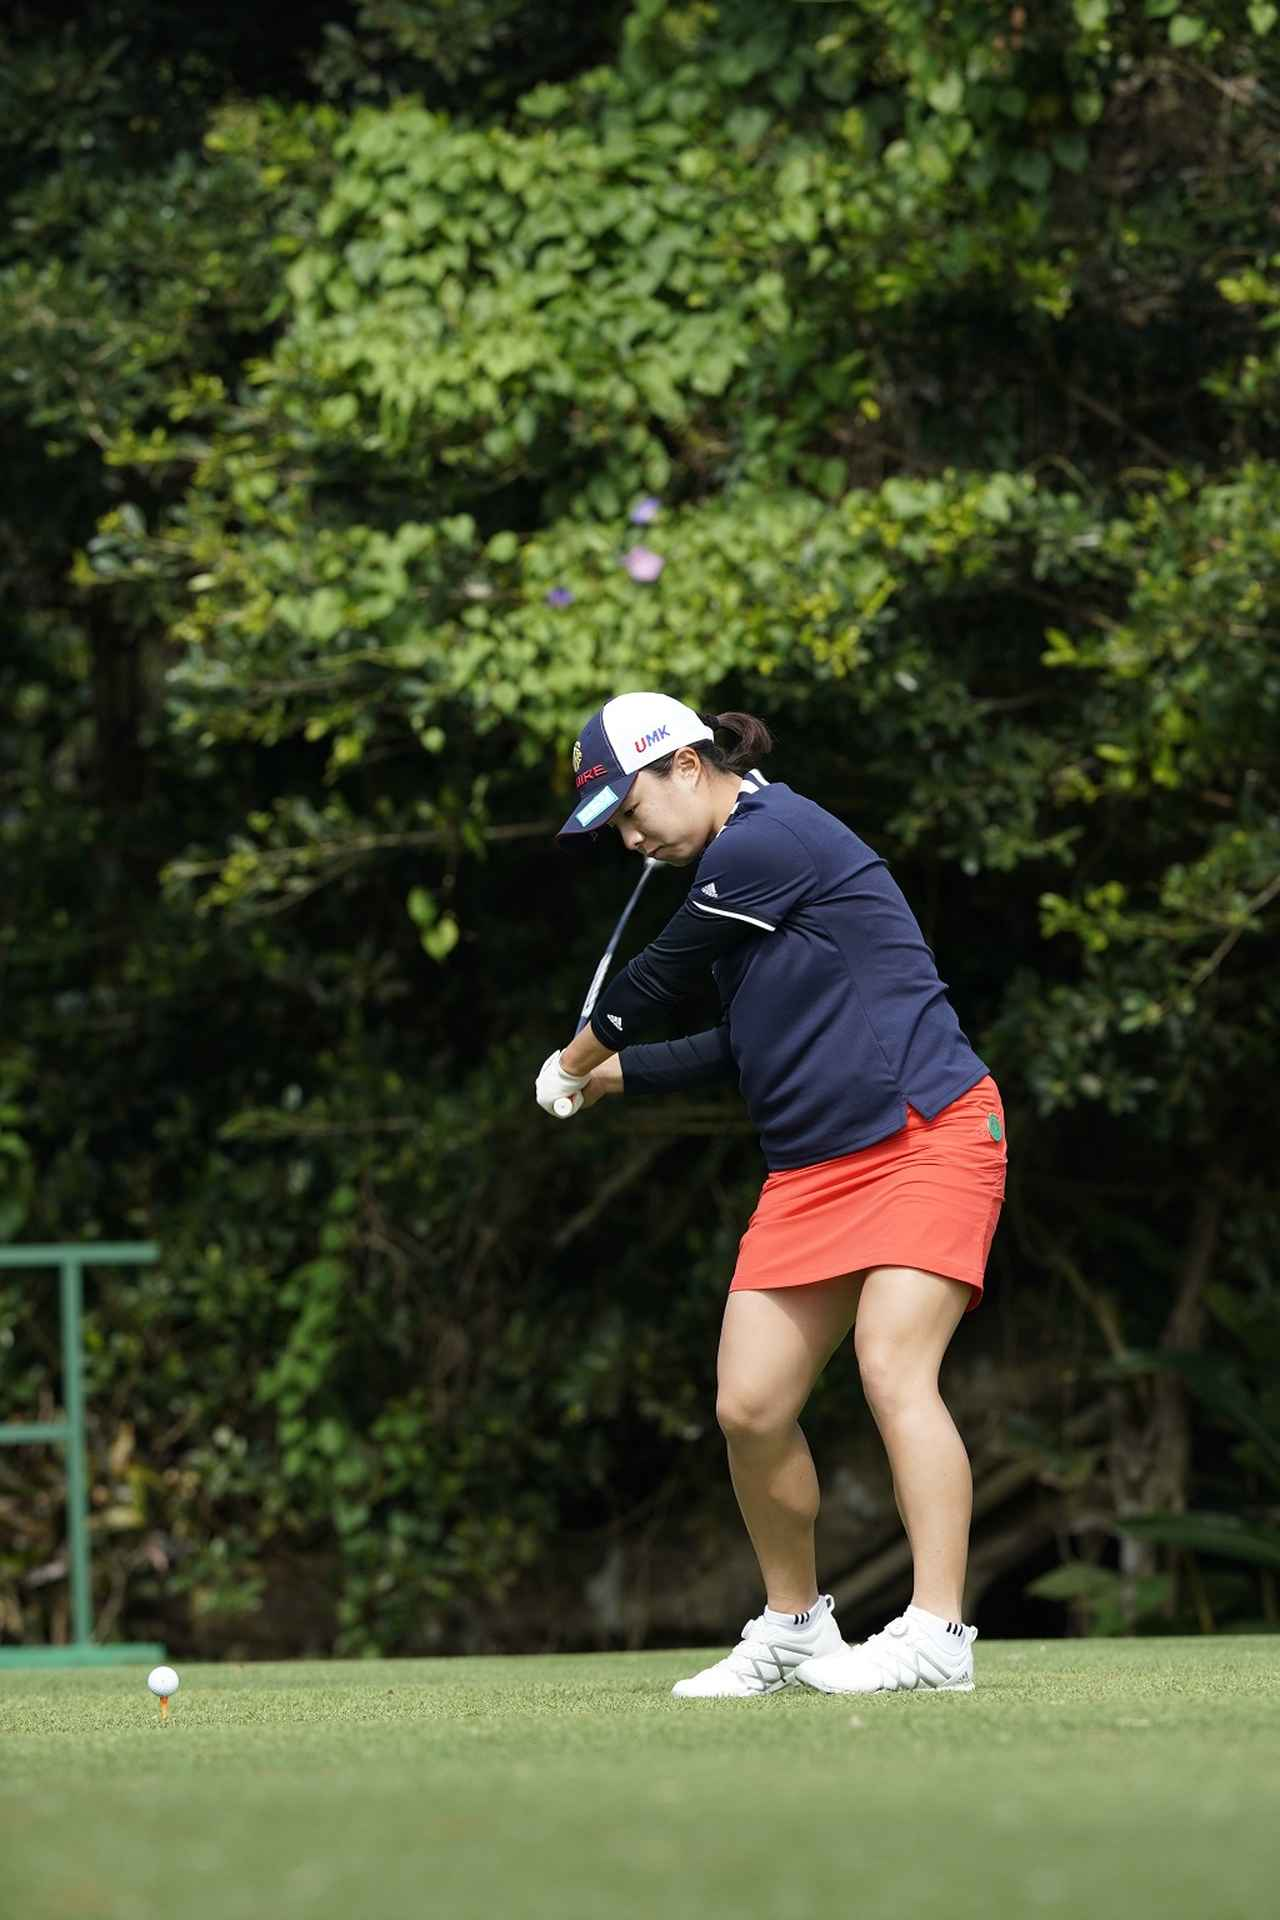 Images : 永峰咲希のドライバー連続写真